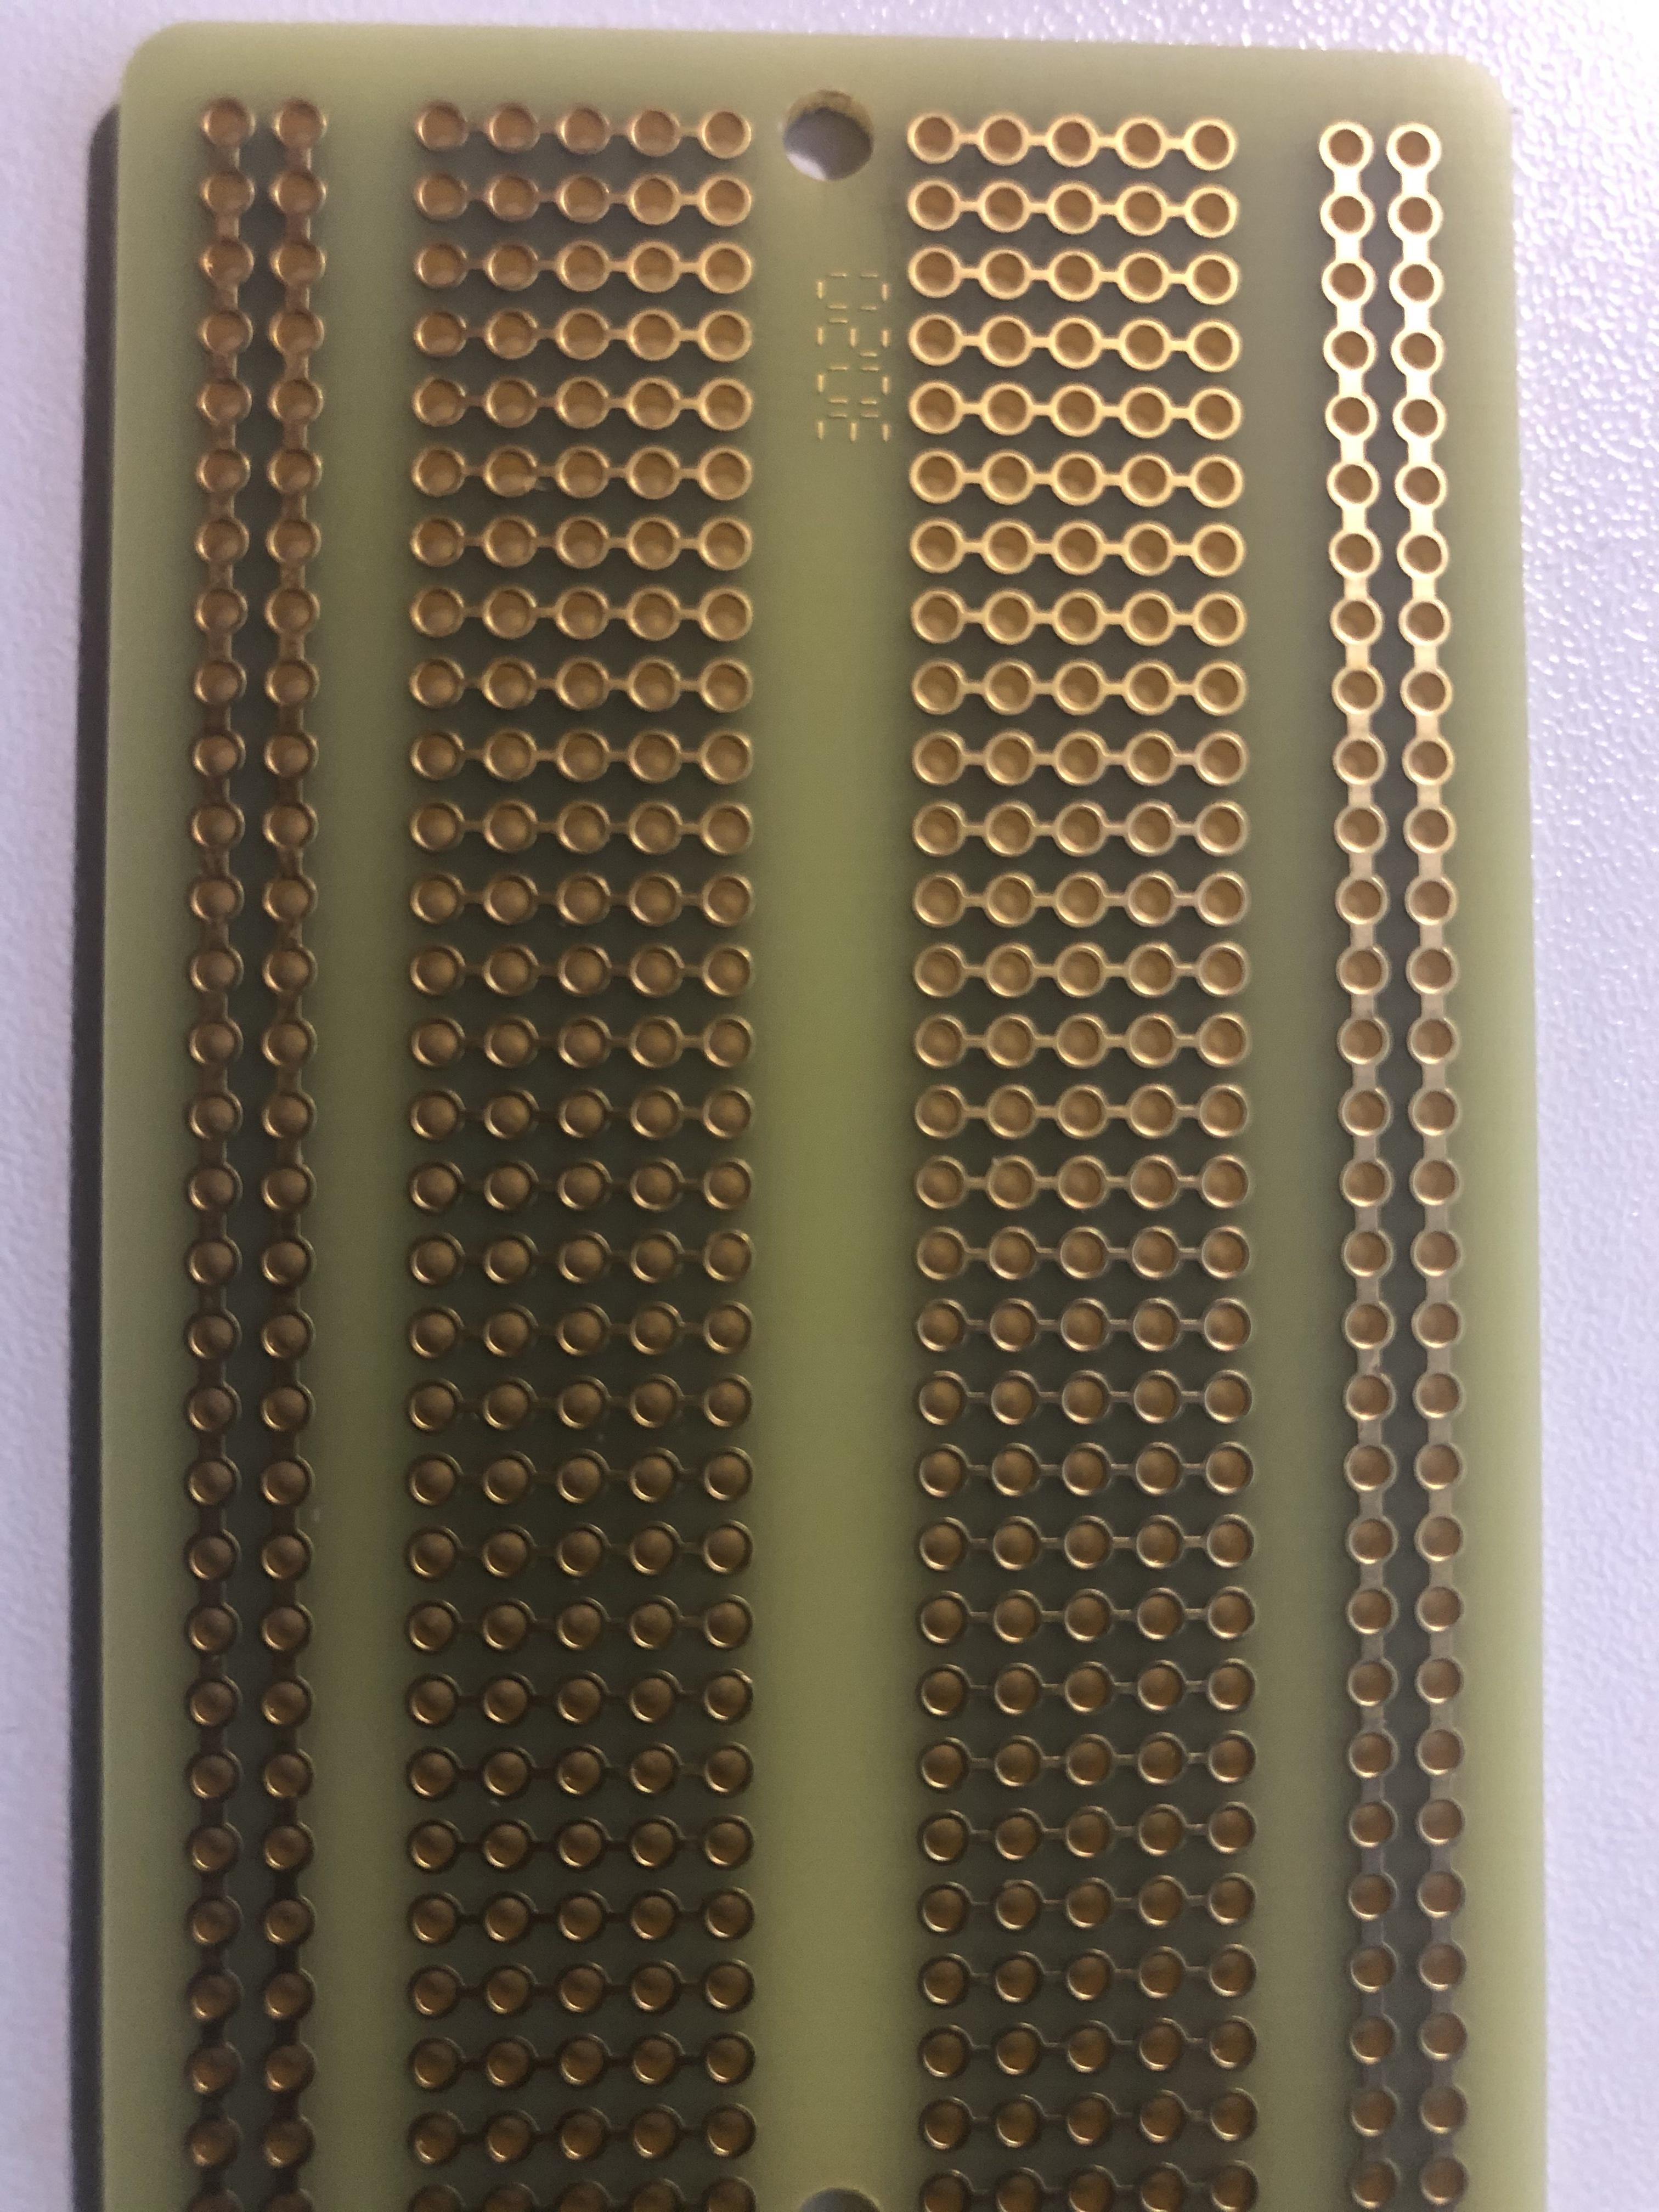 Back of Adafruit perma-proto board